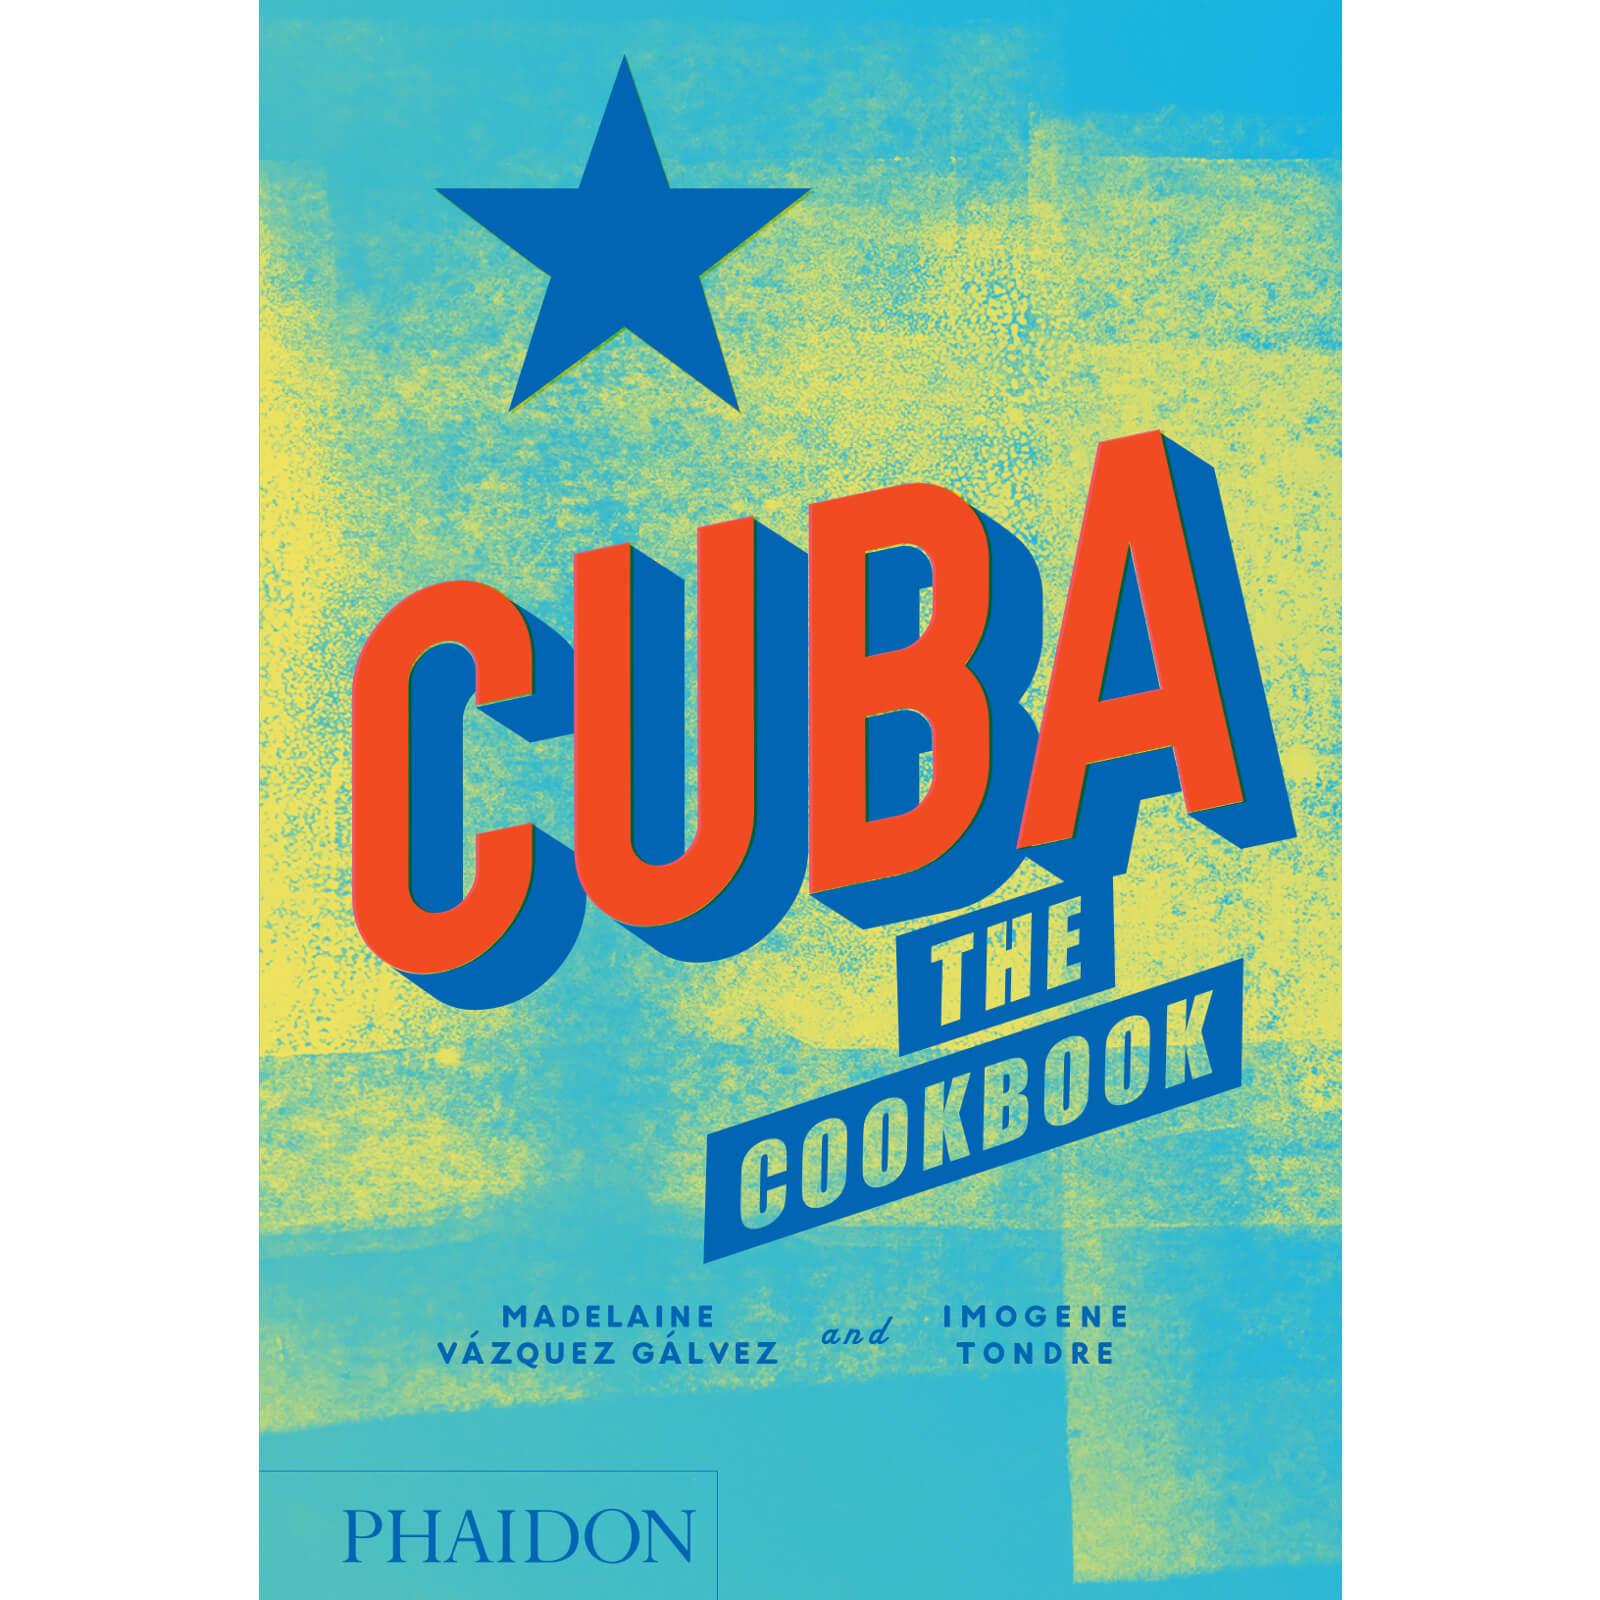 Phaidon: Cuba - The Cookbook